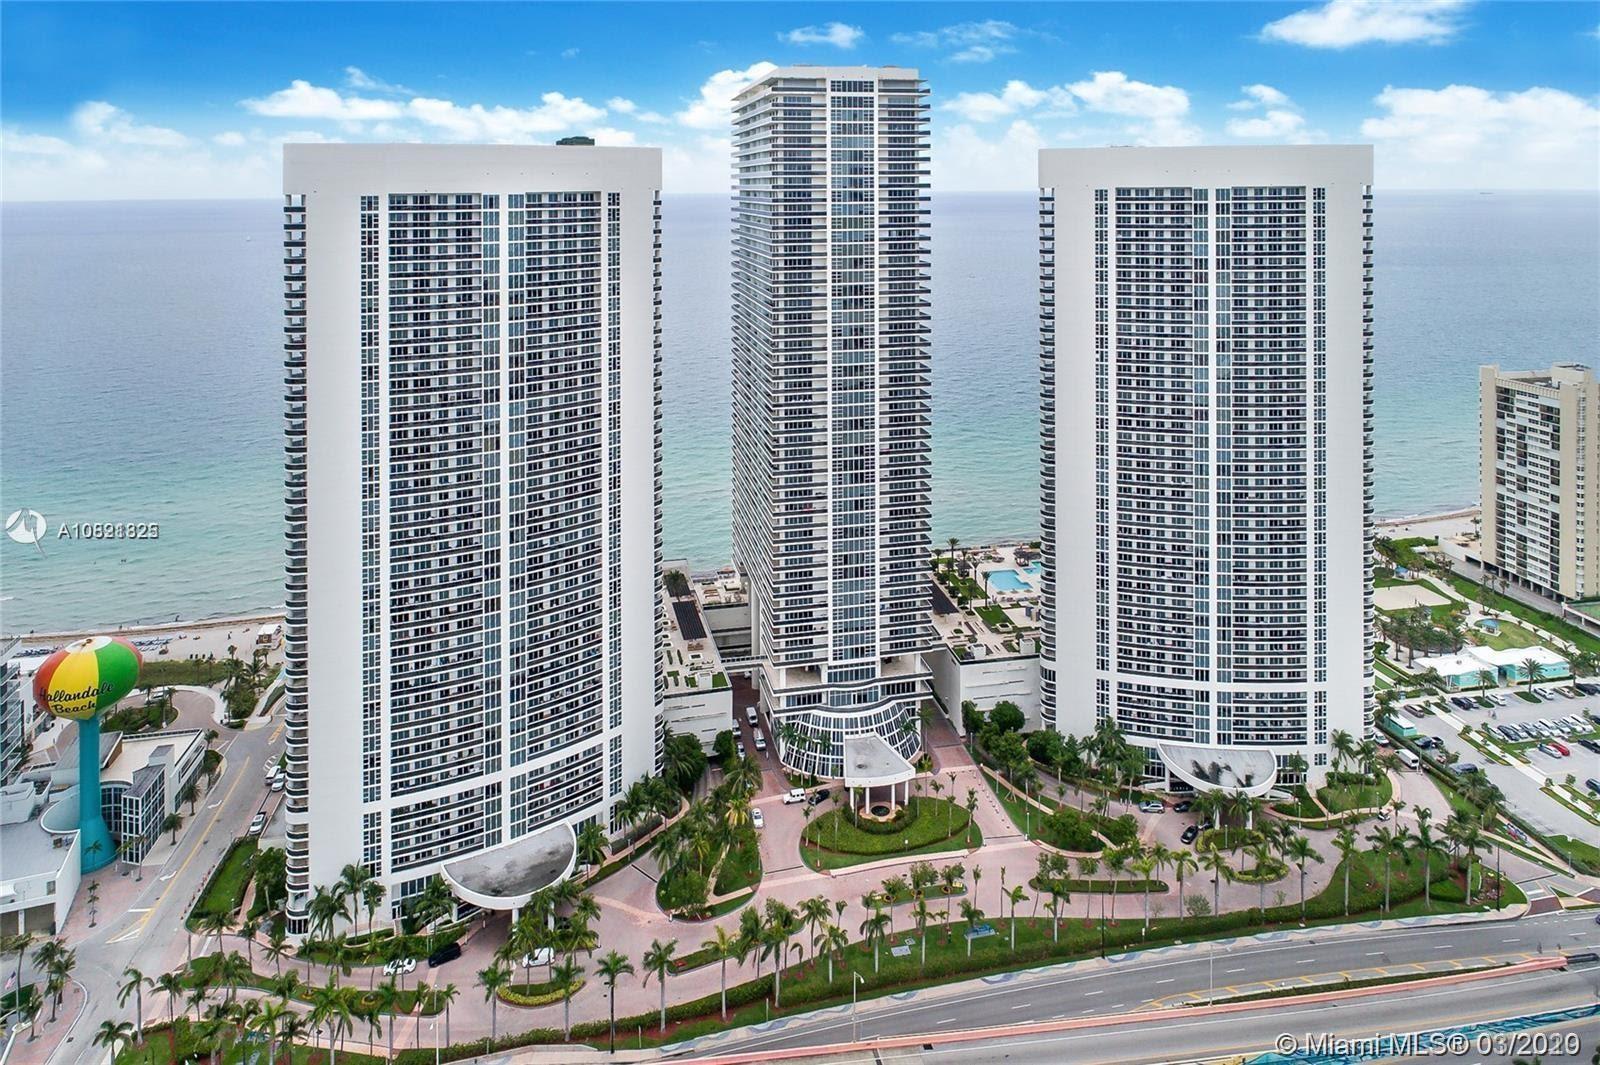 Beach Club Hallandale Florida real estate